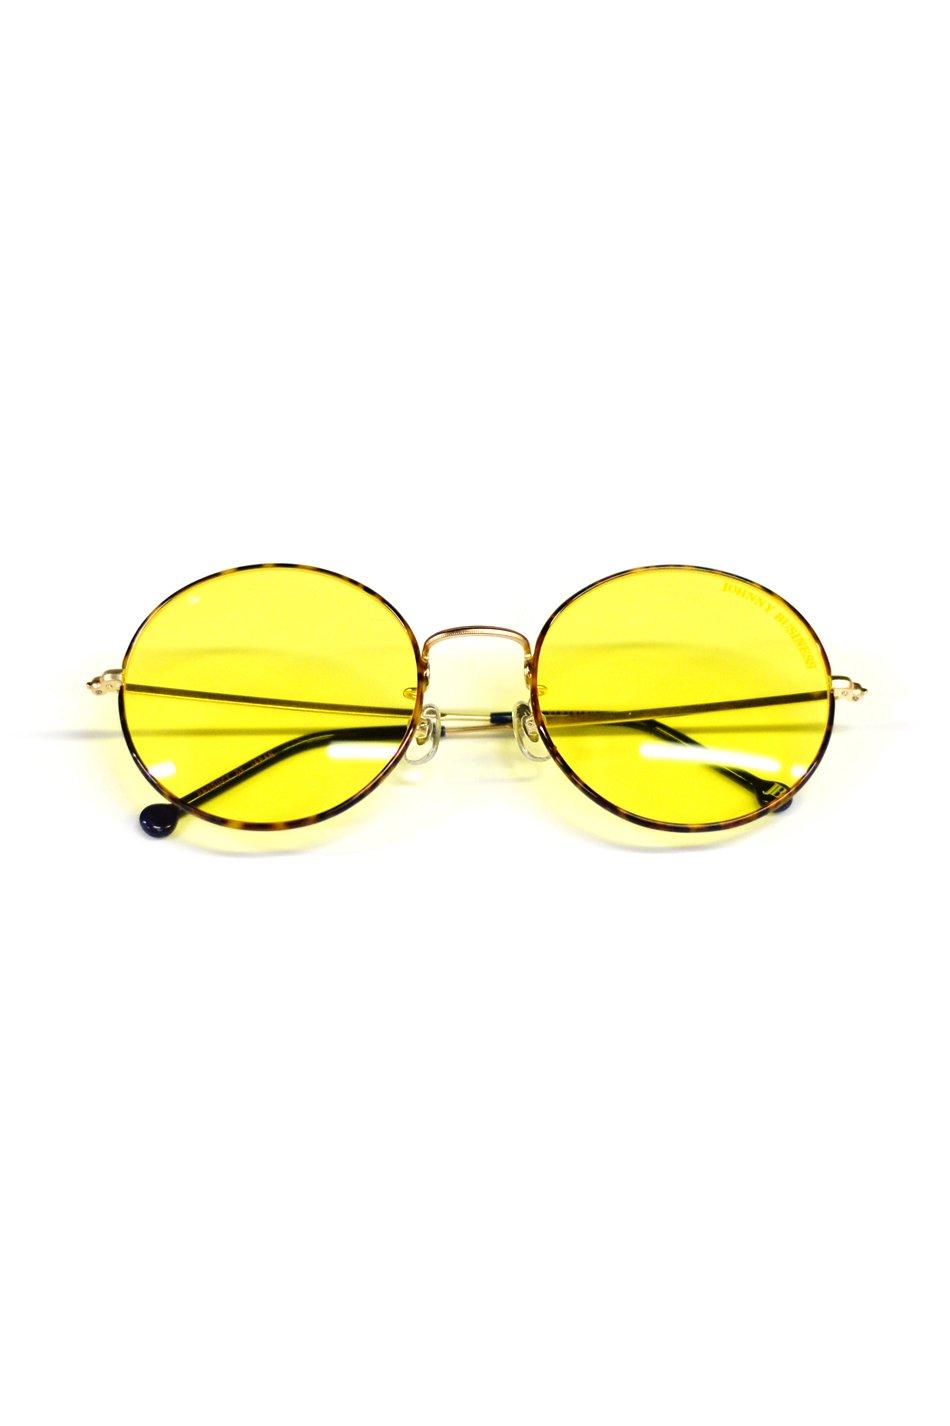 Johnny Business × VERYNERD Effie Rd. Type JB / Yellow